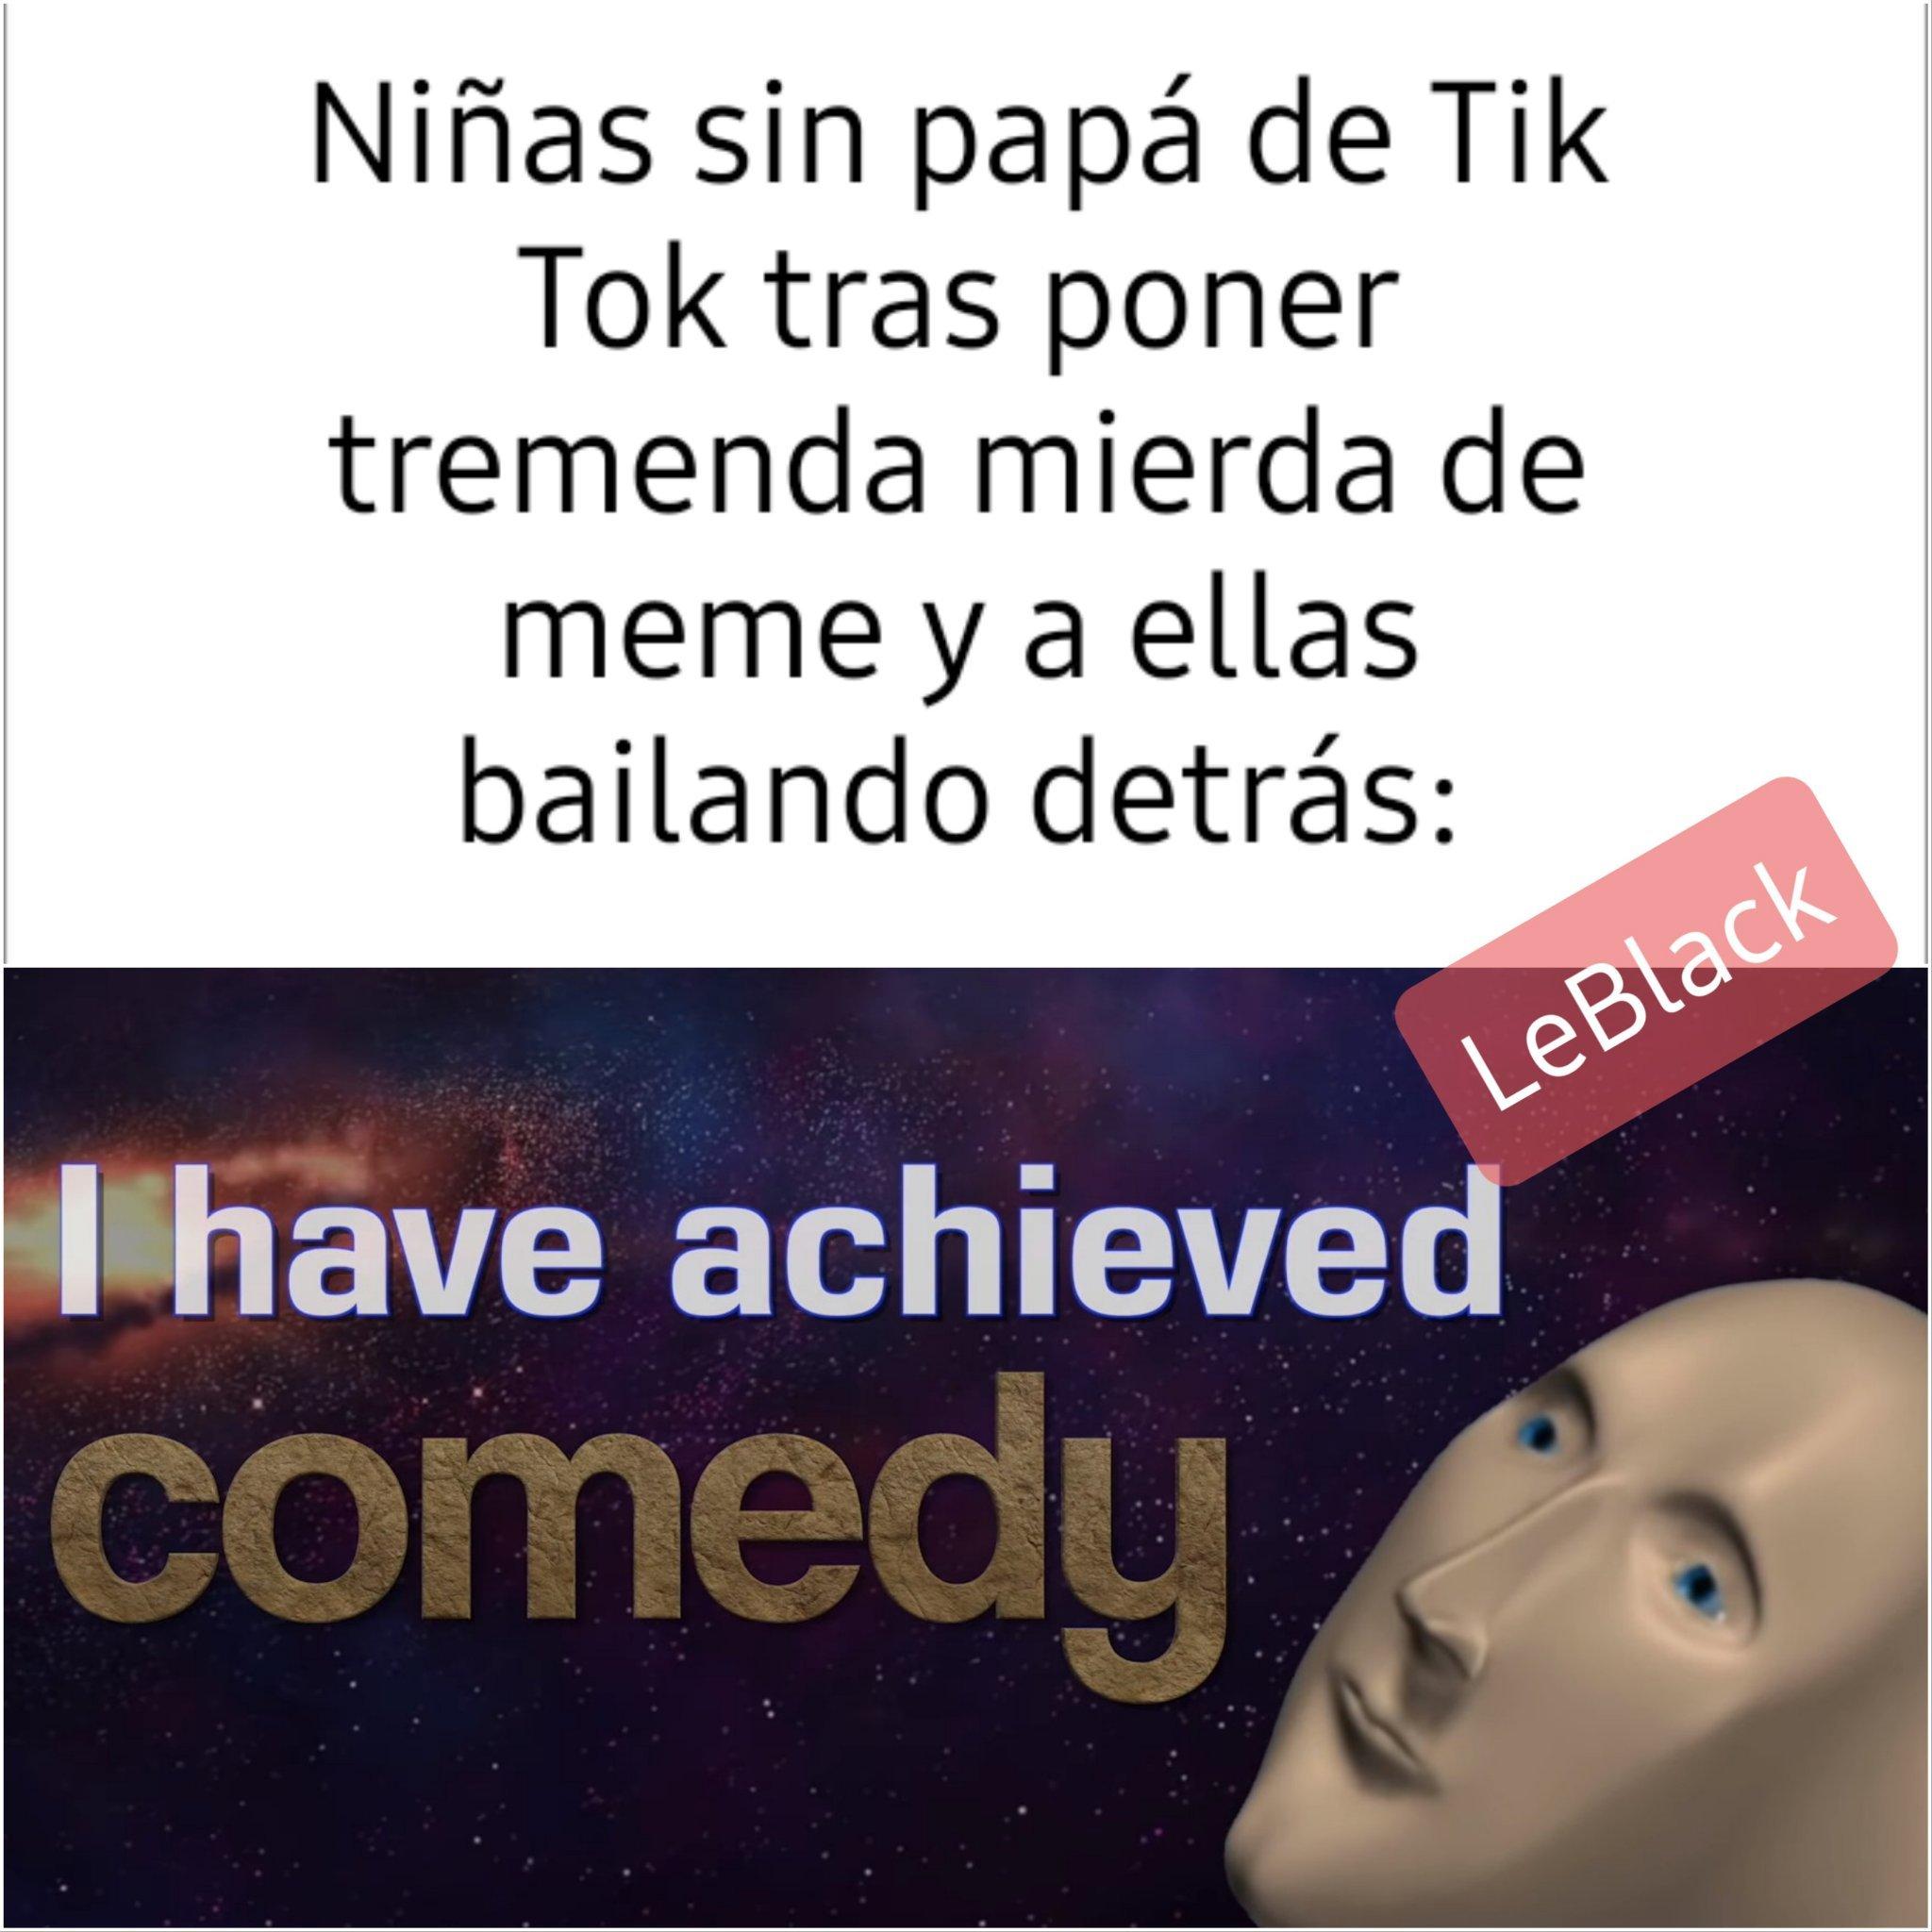 Confirmen - meme